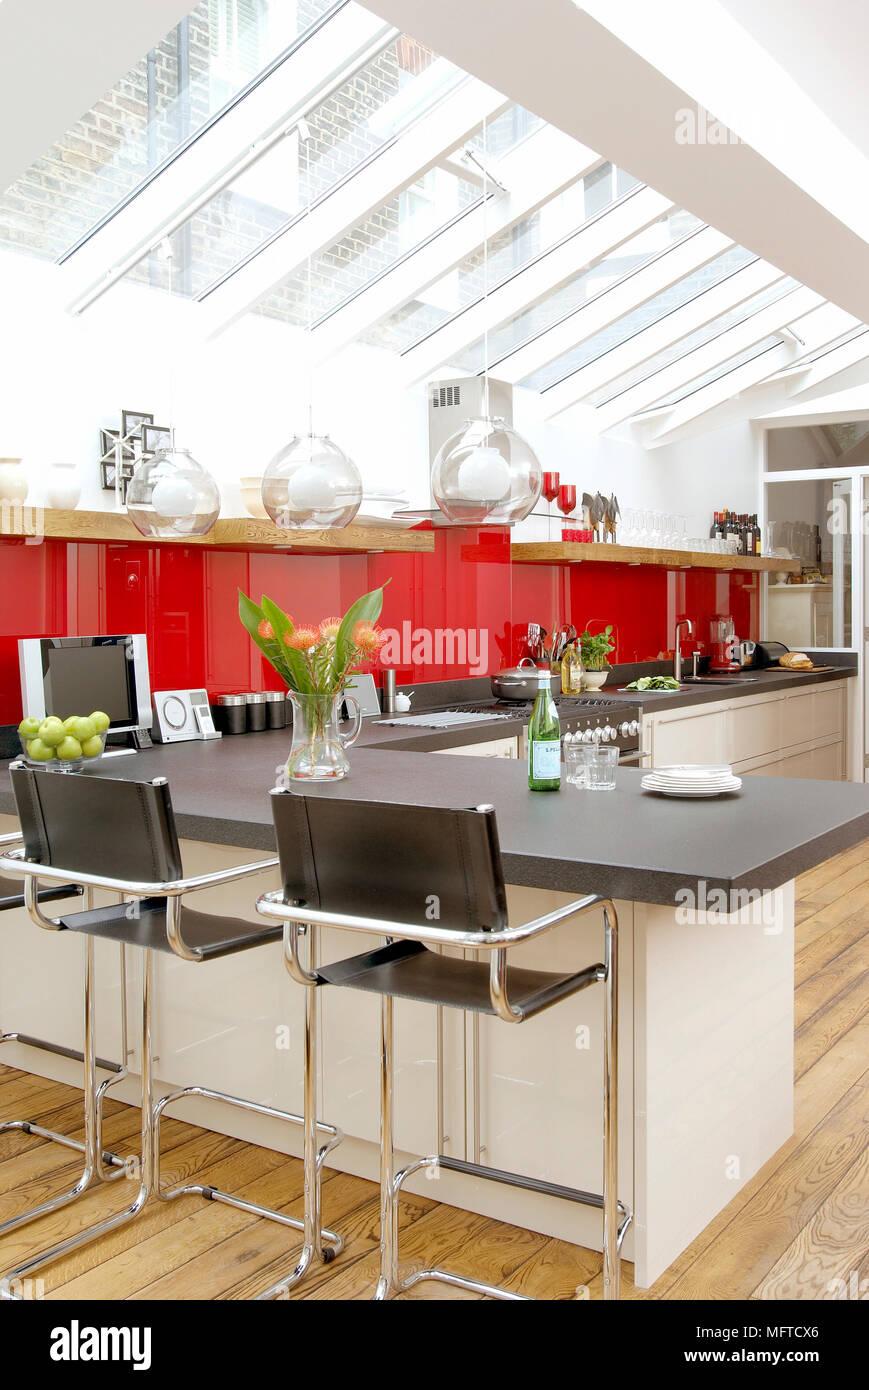 Miraculous Bar Stools At Breakfast Bar In Modern Spacious Kitchen Stock Machost Co Dining Chair Design Ideas Machostcouk